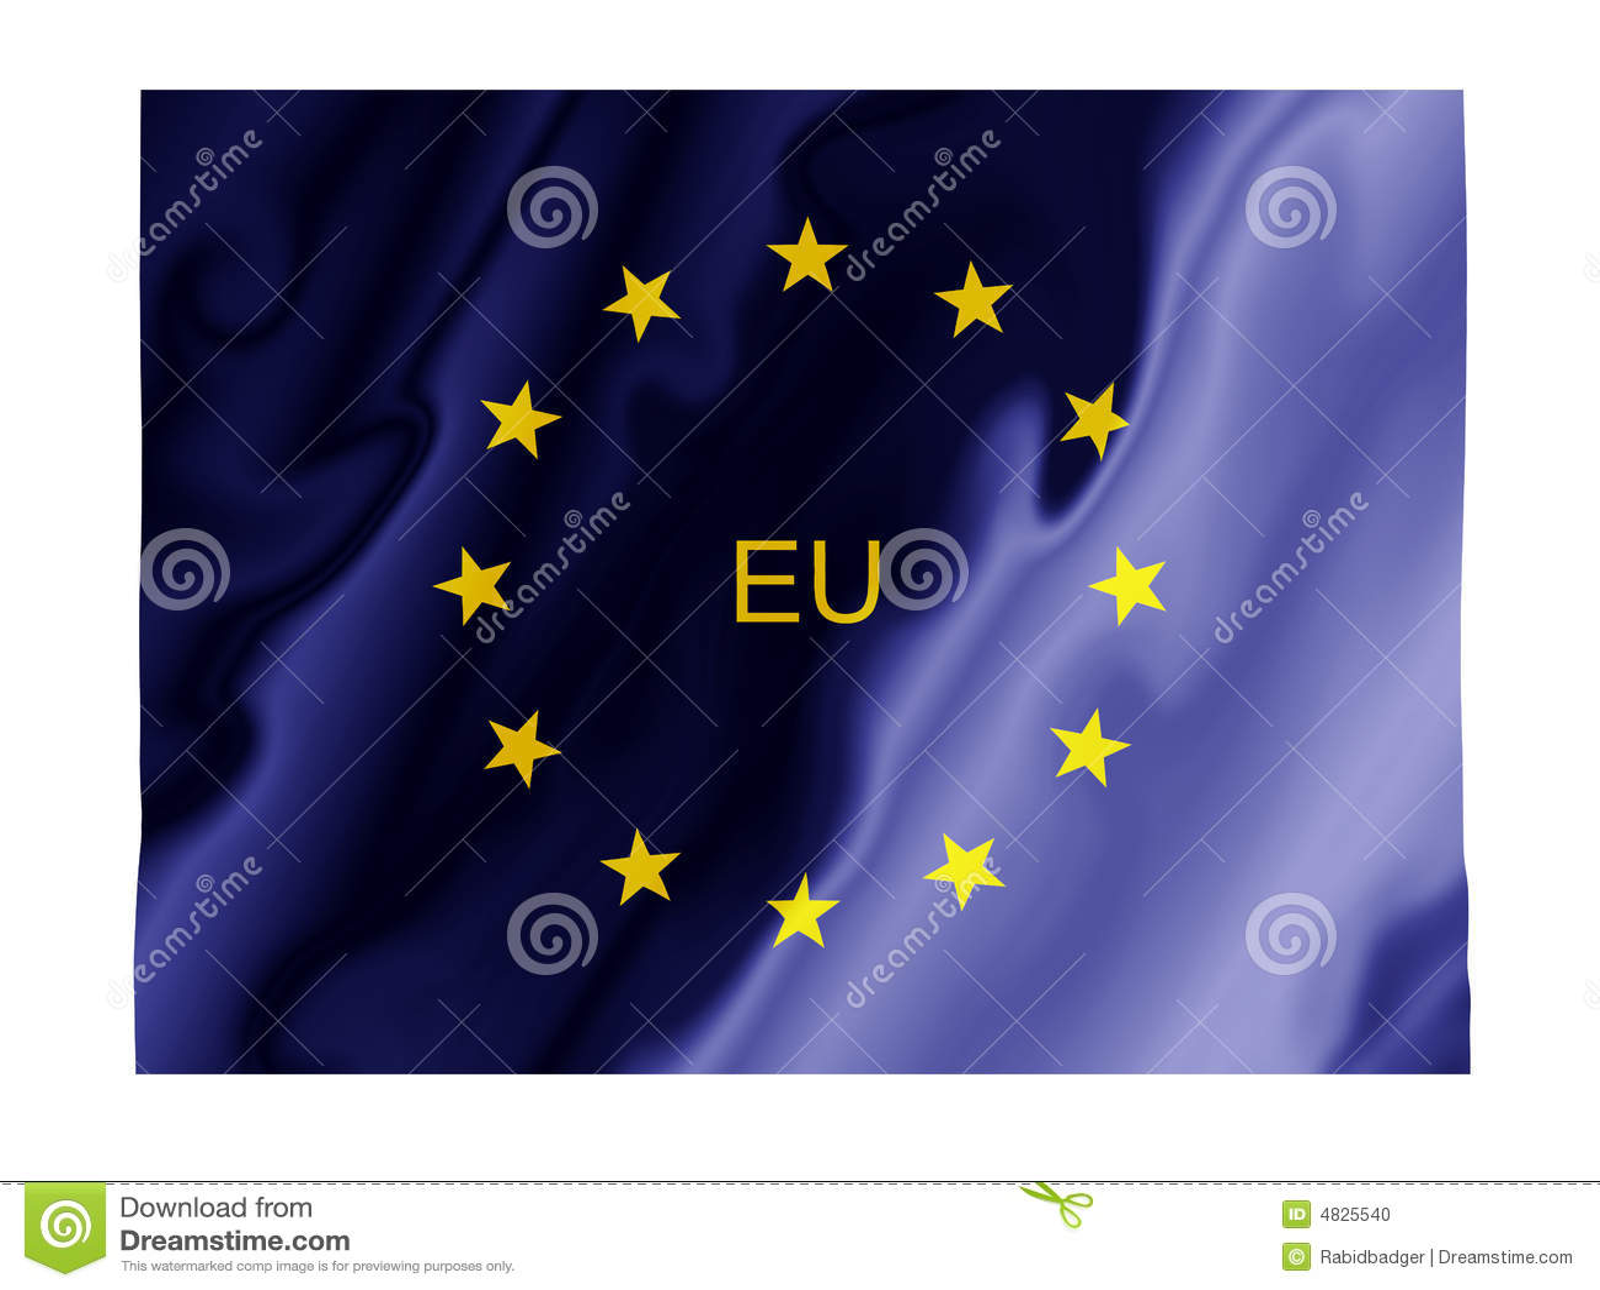 EU-Flattern